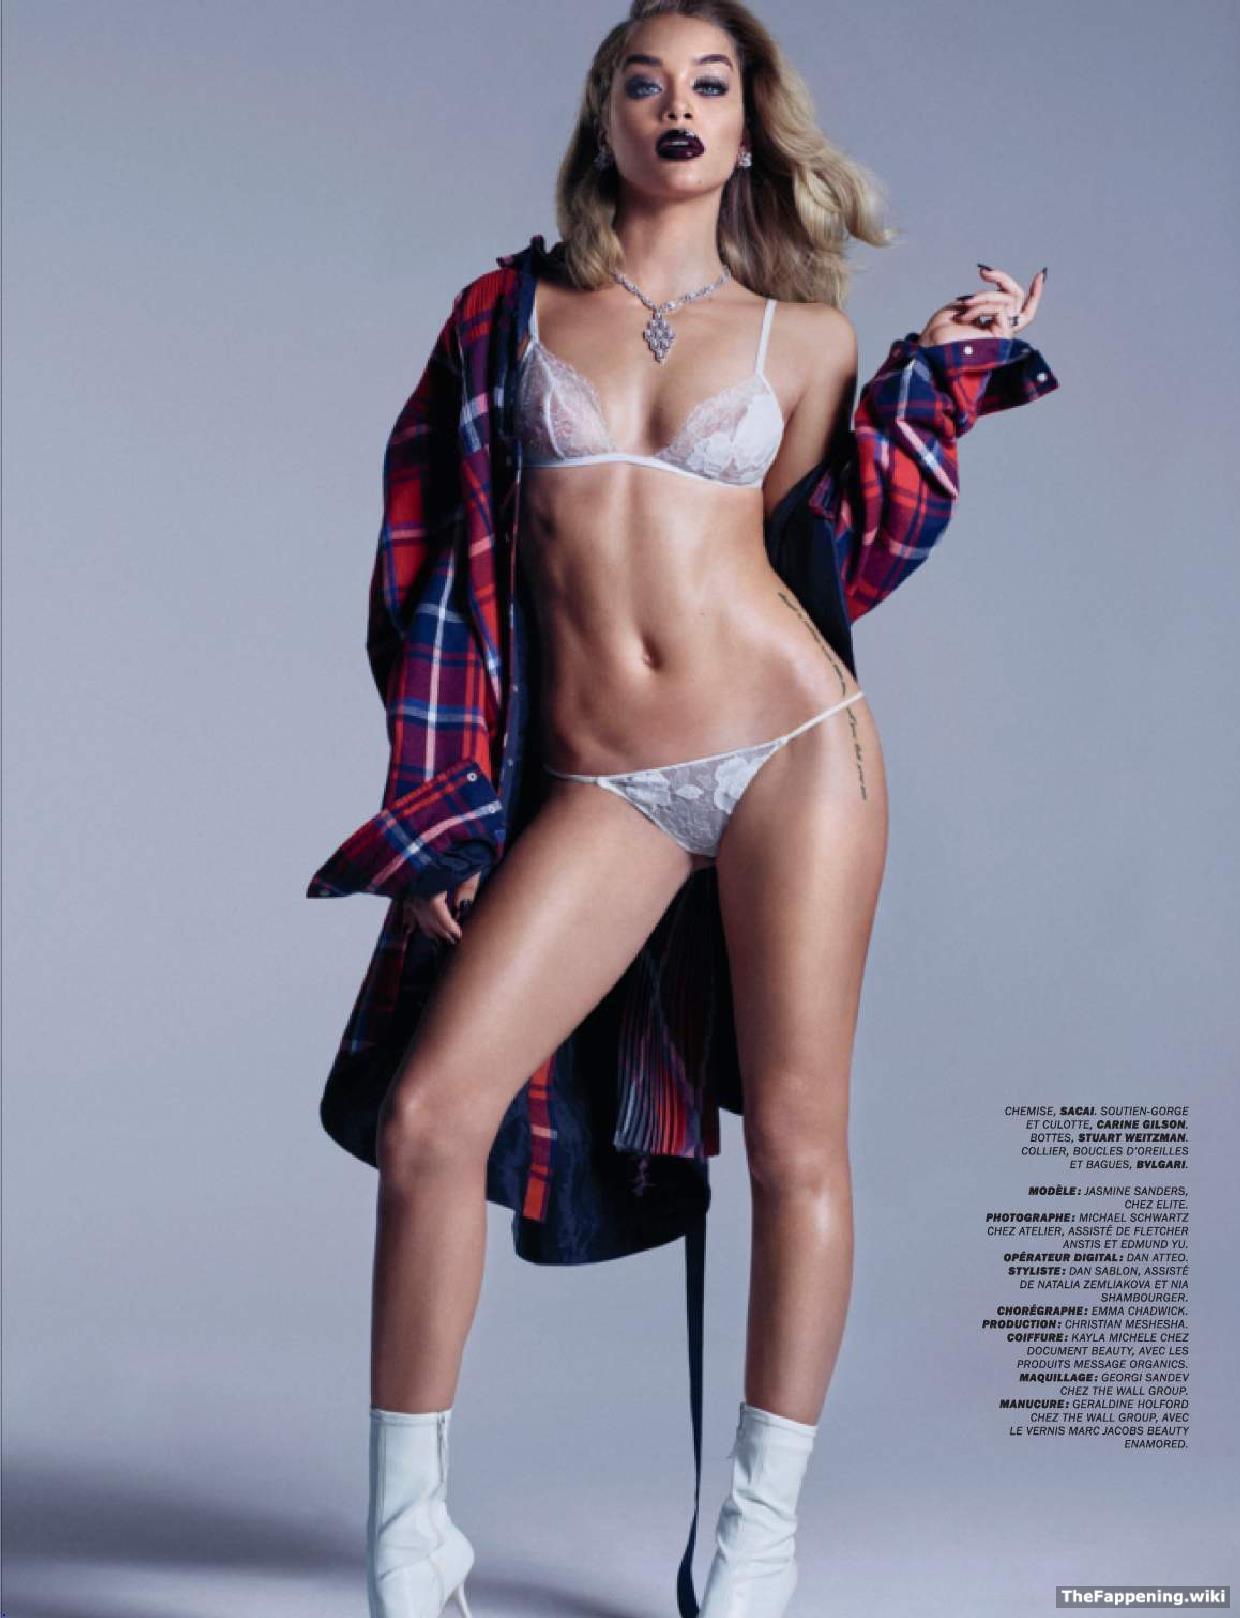 Niykee heaton naked,Kylie Jenner boobs pics. 2018-2019 celebrityes photos leaks! Erotic pictures Payton gerdes,Rose McGowan Pokies